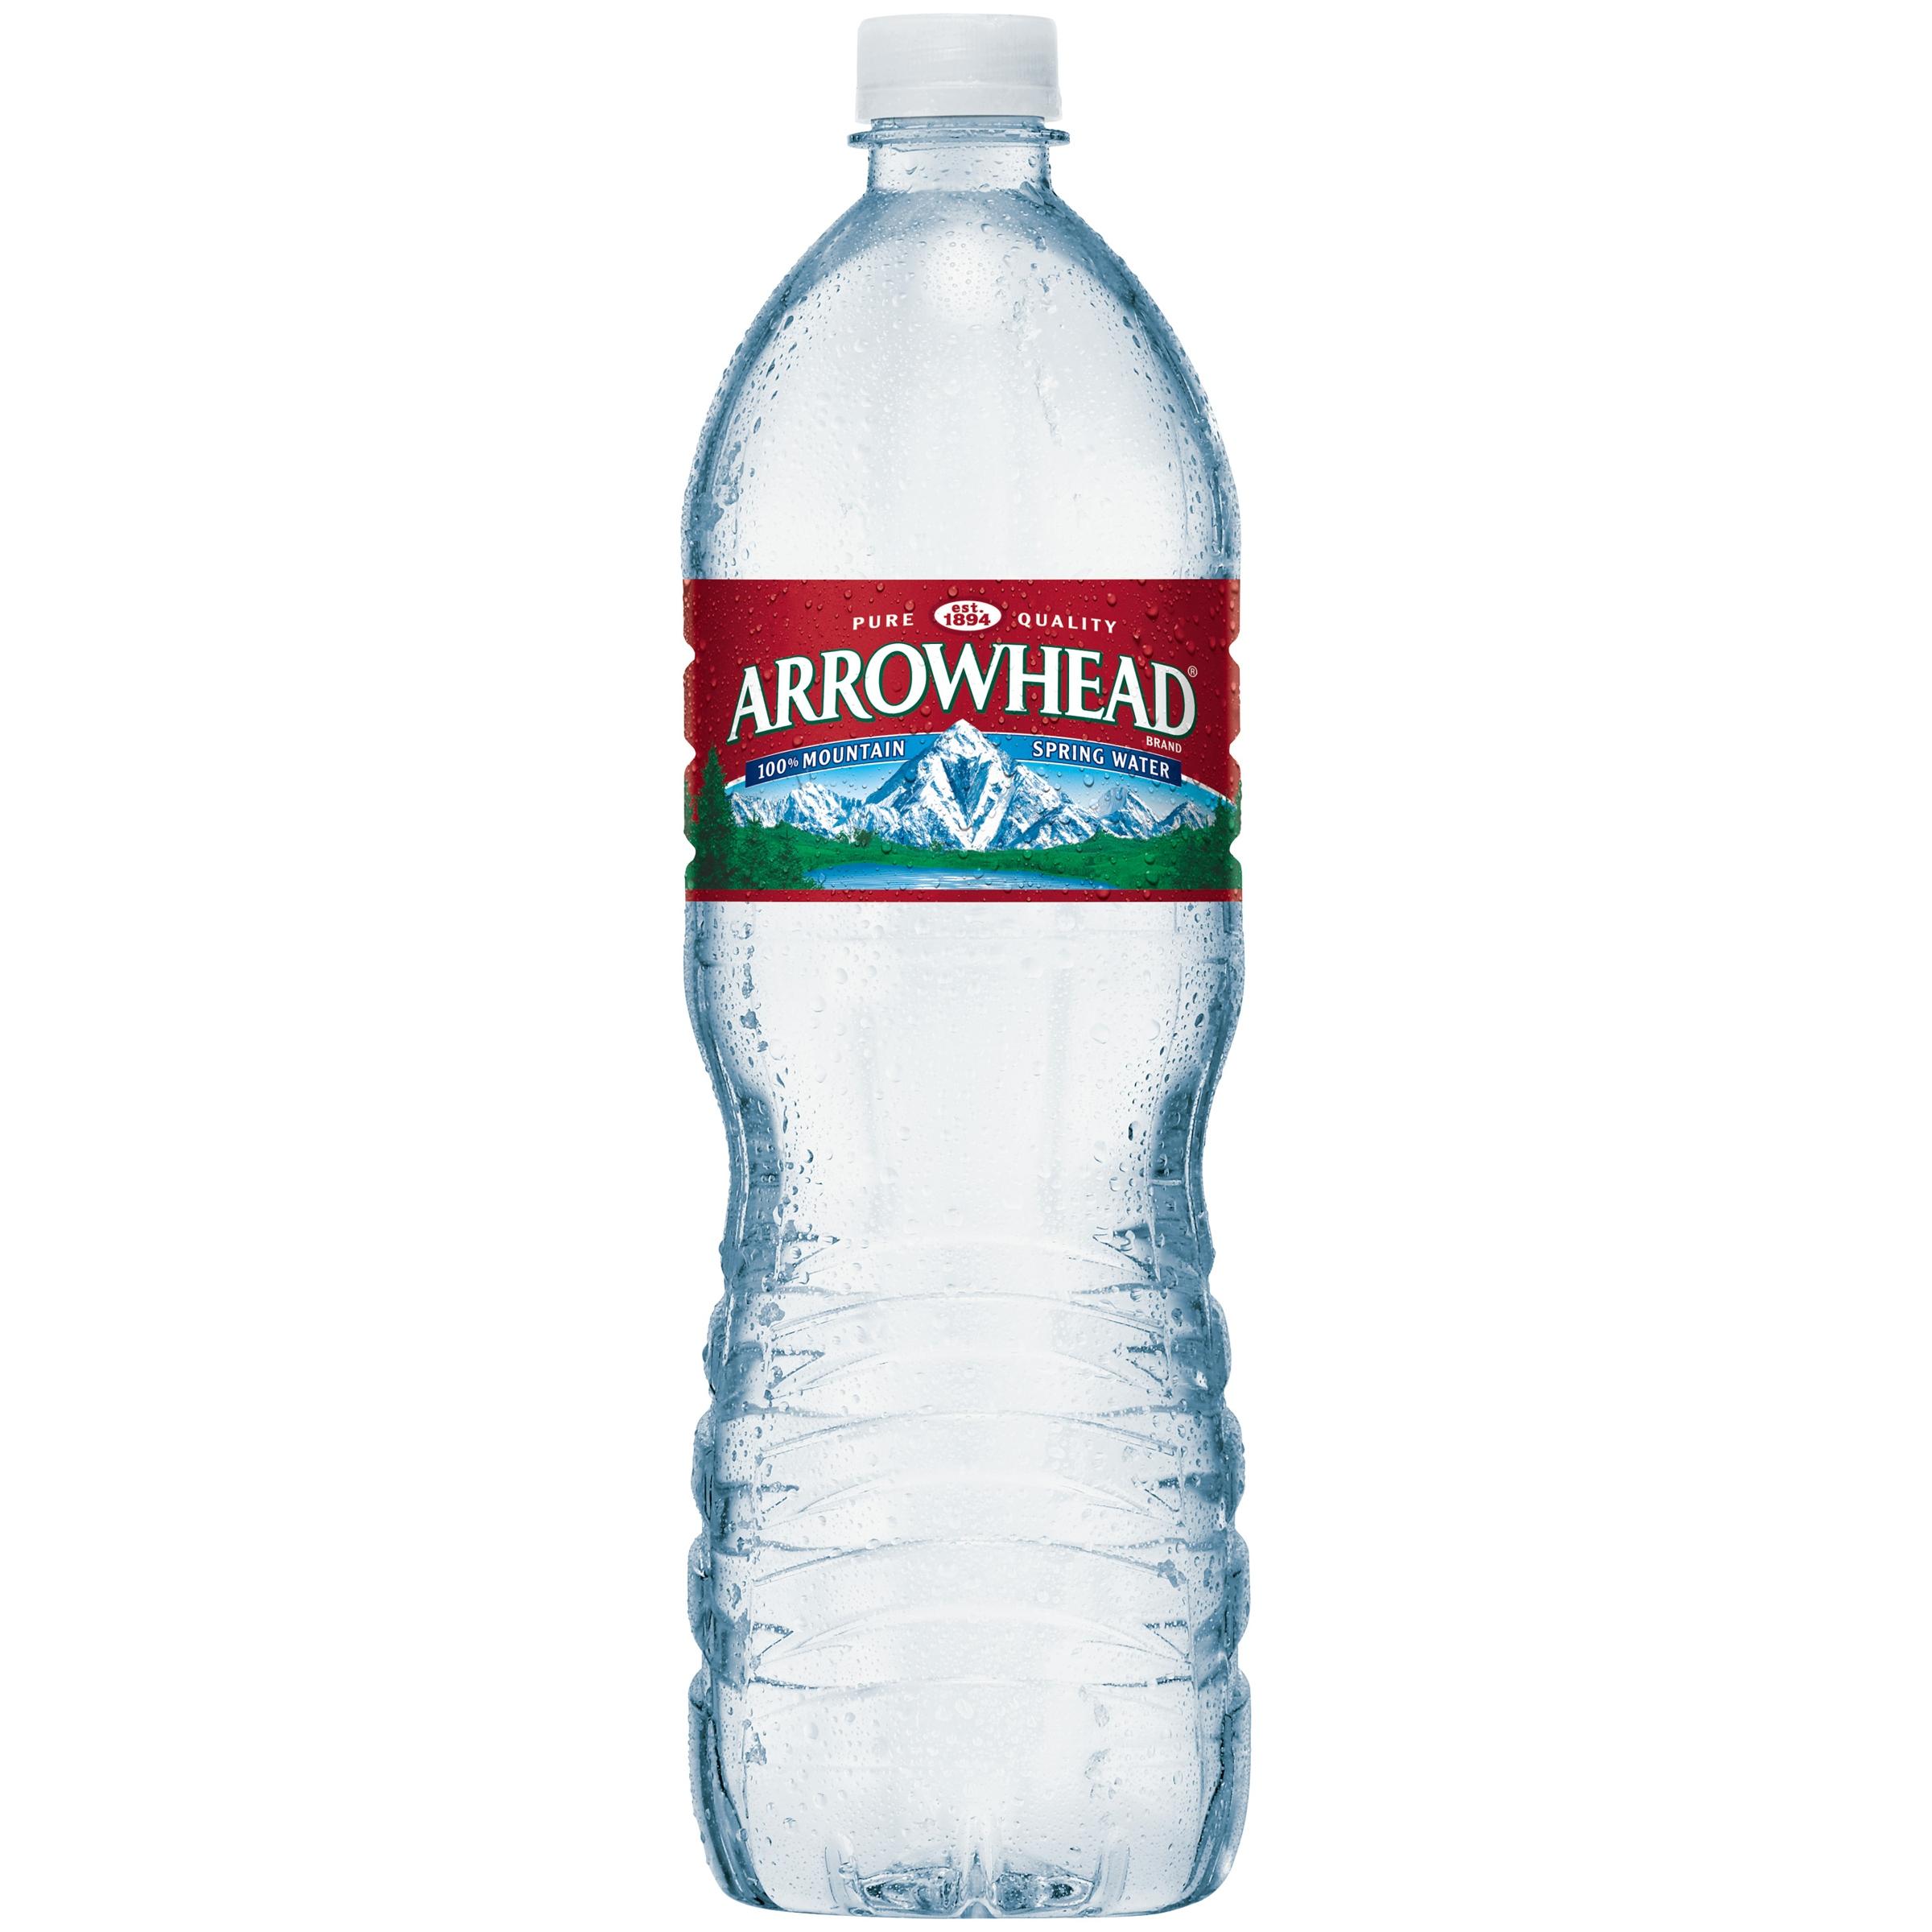 Arrowhead Mountain Spring Water, 33.8 Fl. Oz.